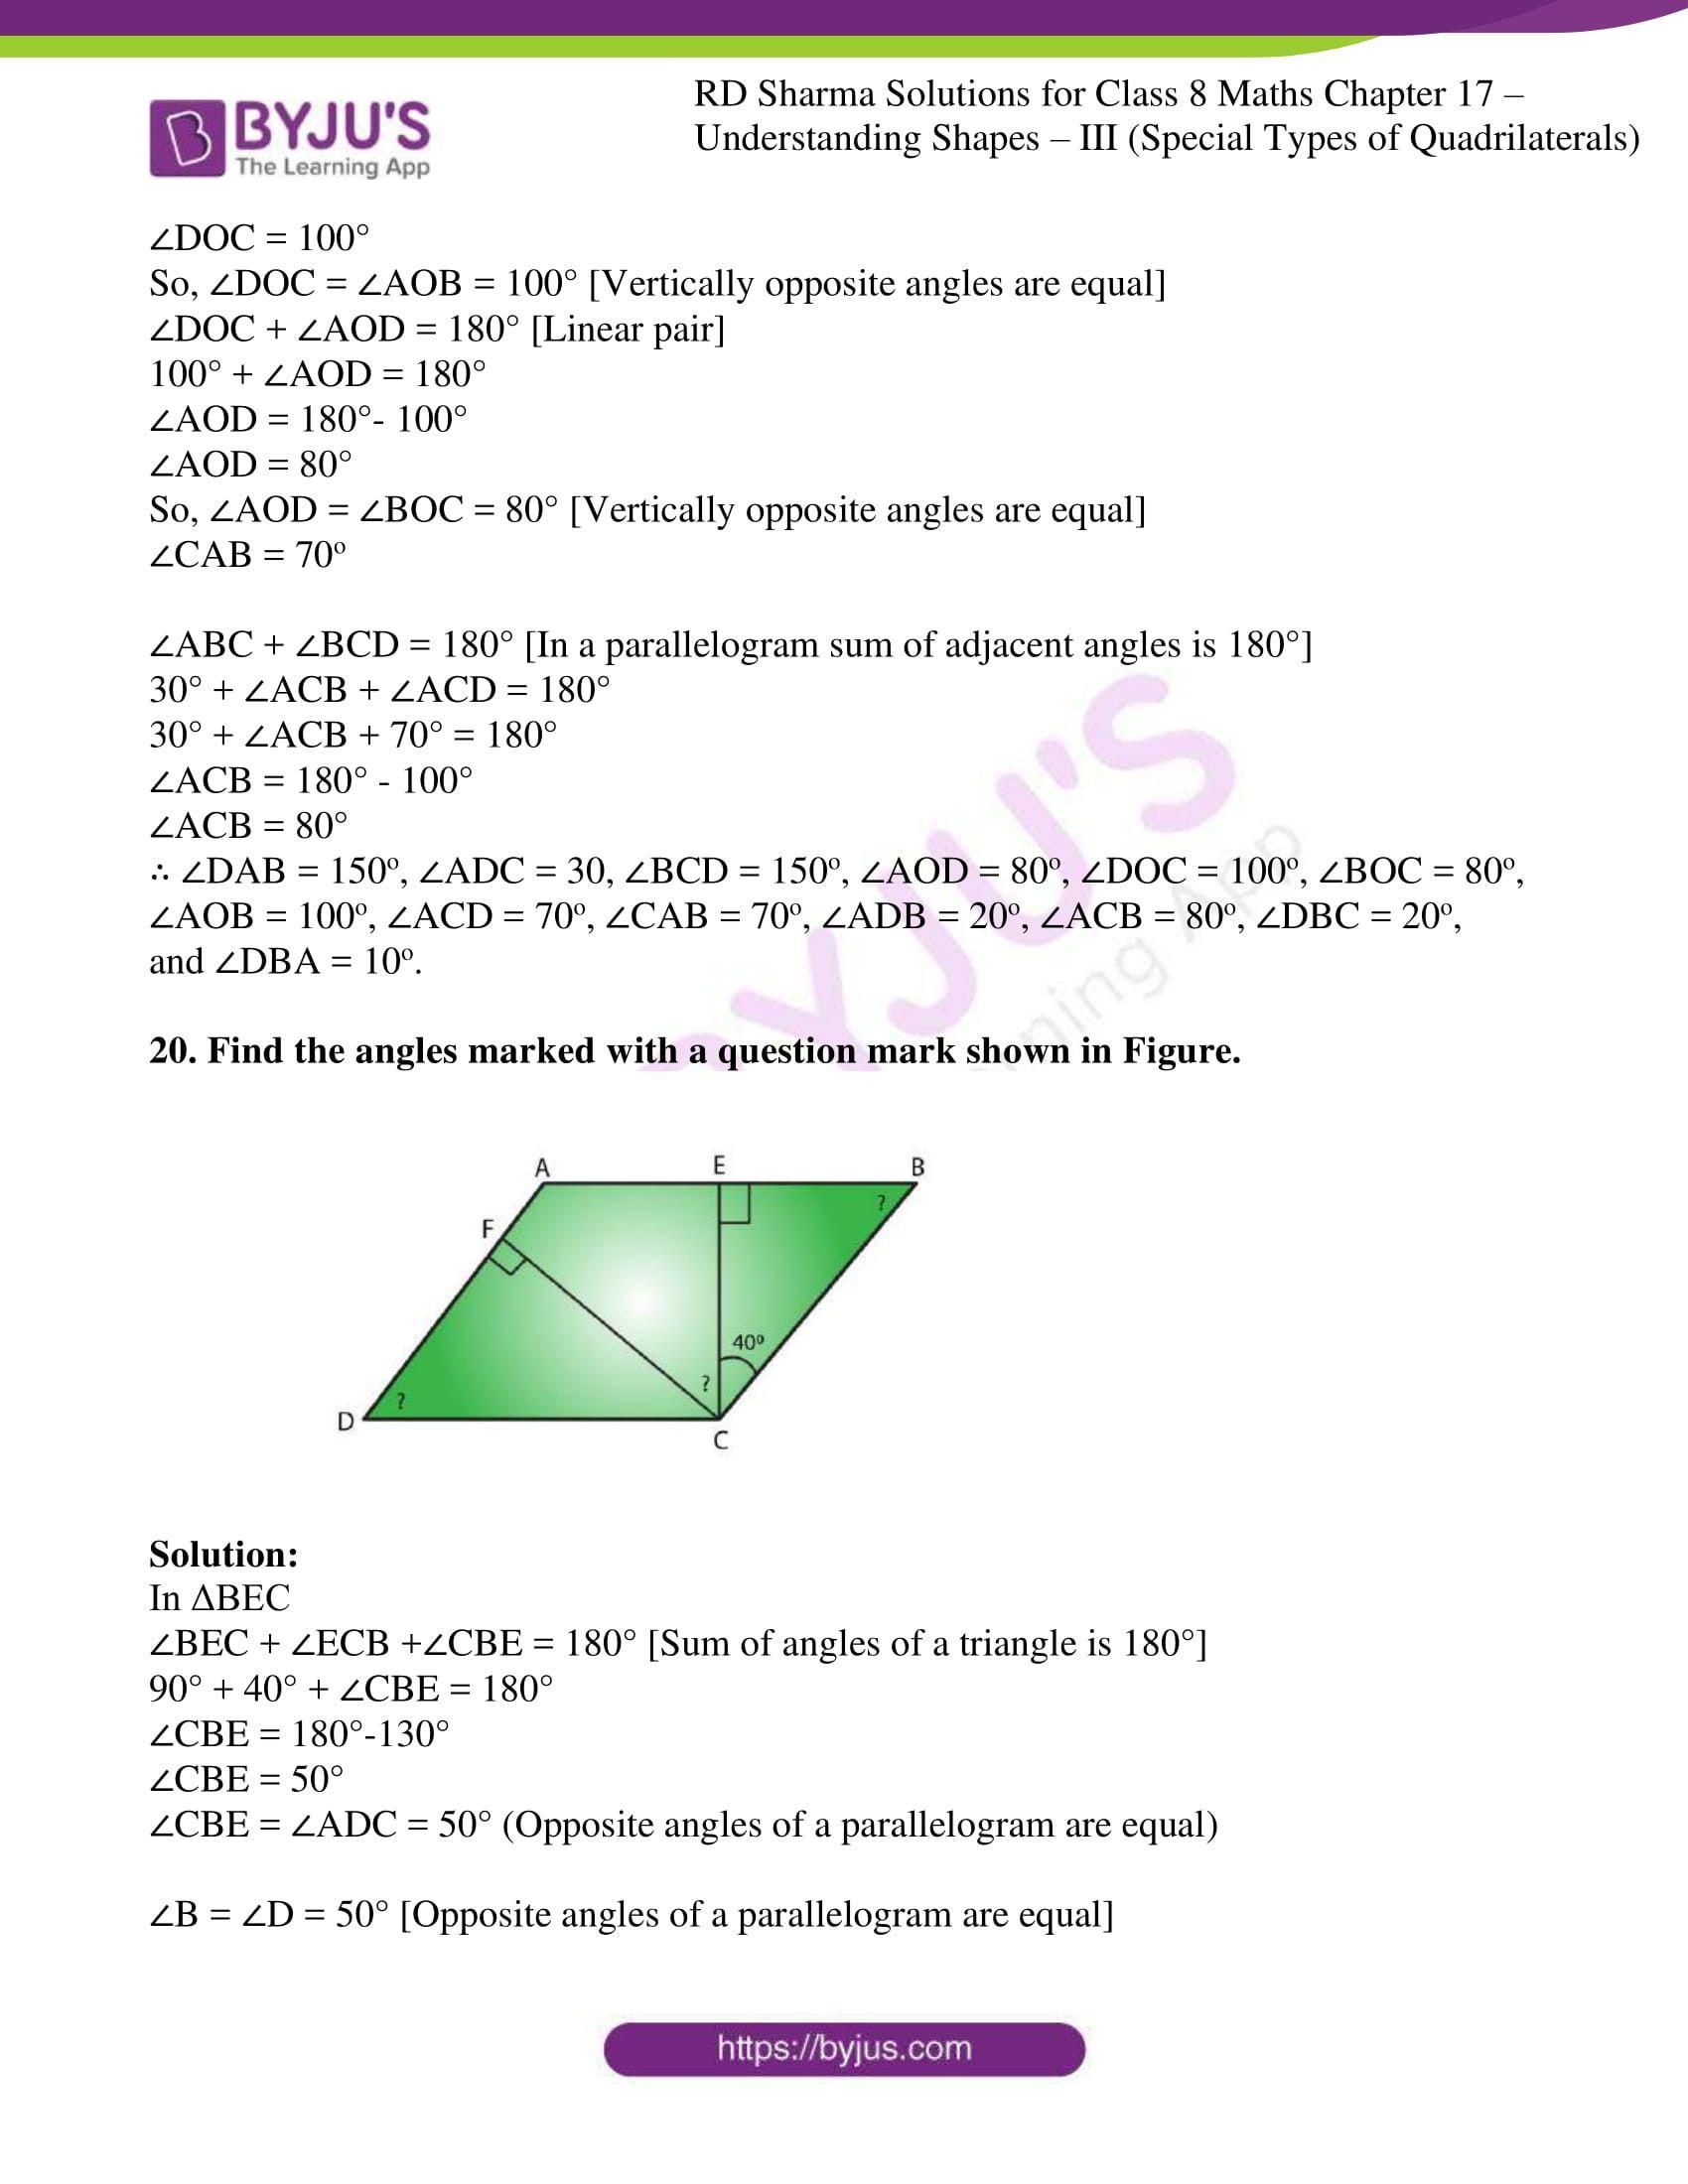 Free Math Worksheets Third Grade 3 Geometry Quadrilaterals Identify In 2020 Free Math Worksheets Free Math Math Worksheets